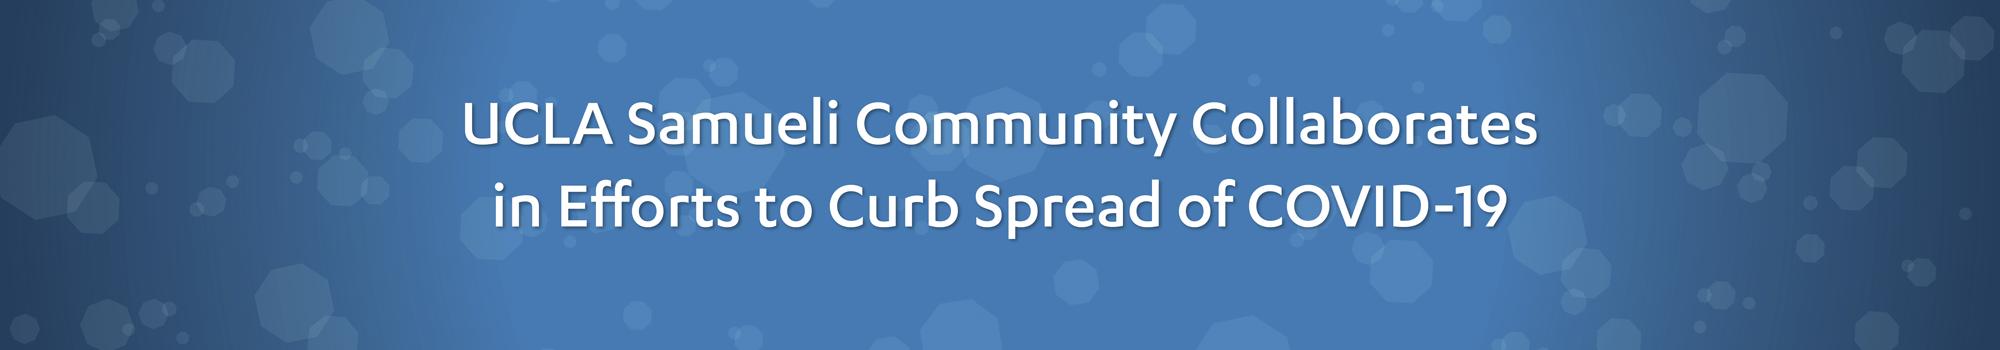 UCLA Samueli Community Collaborates in Efforts to Curb Spread of COVID-19